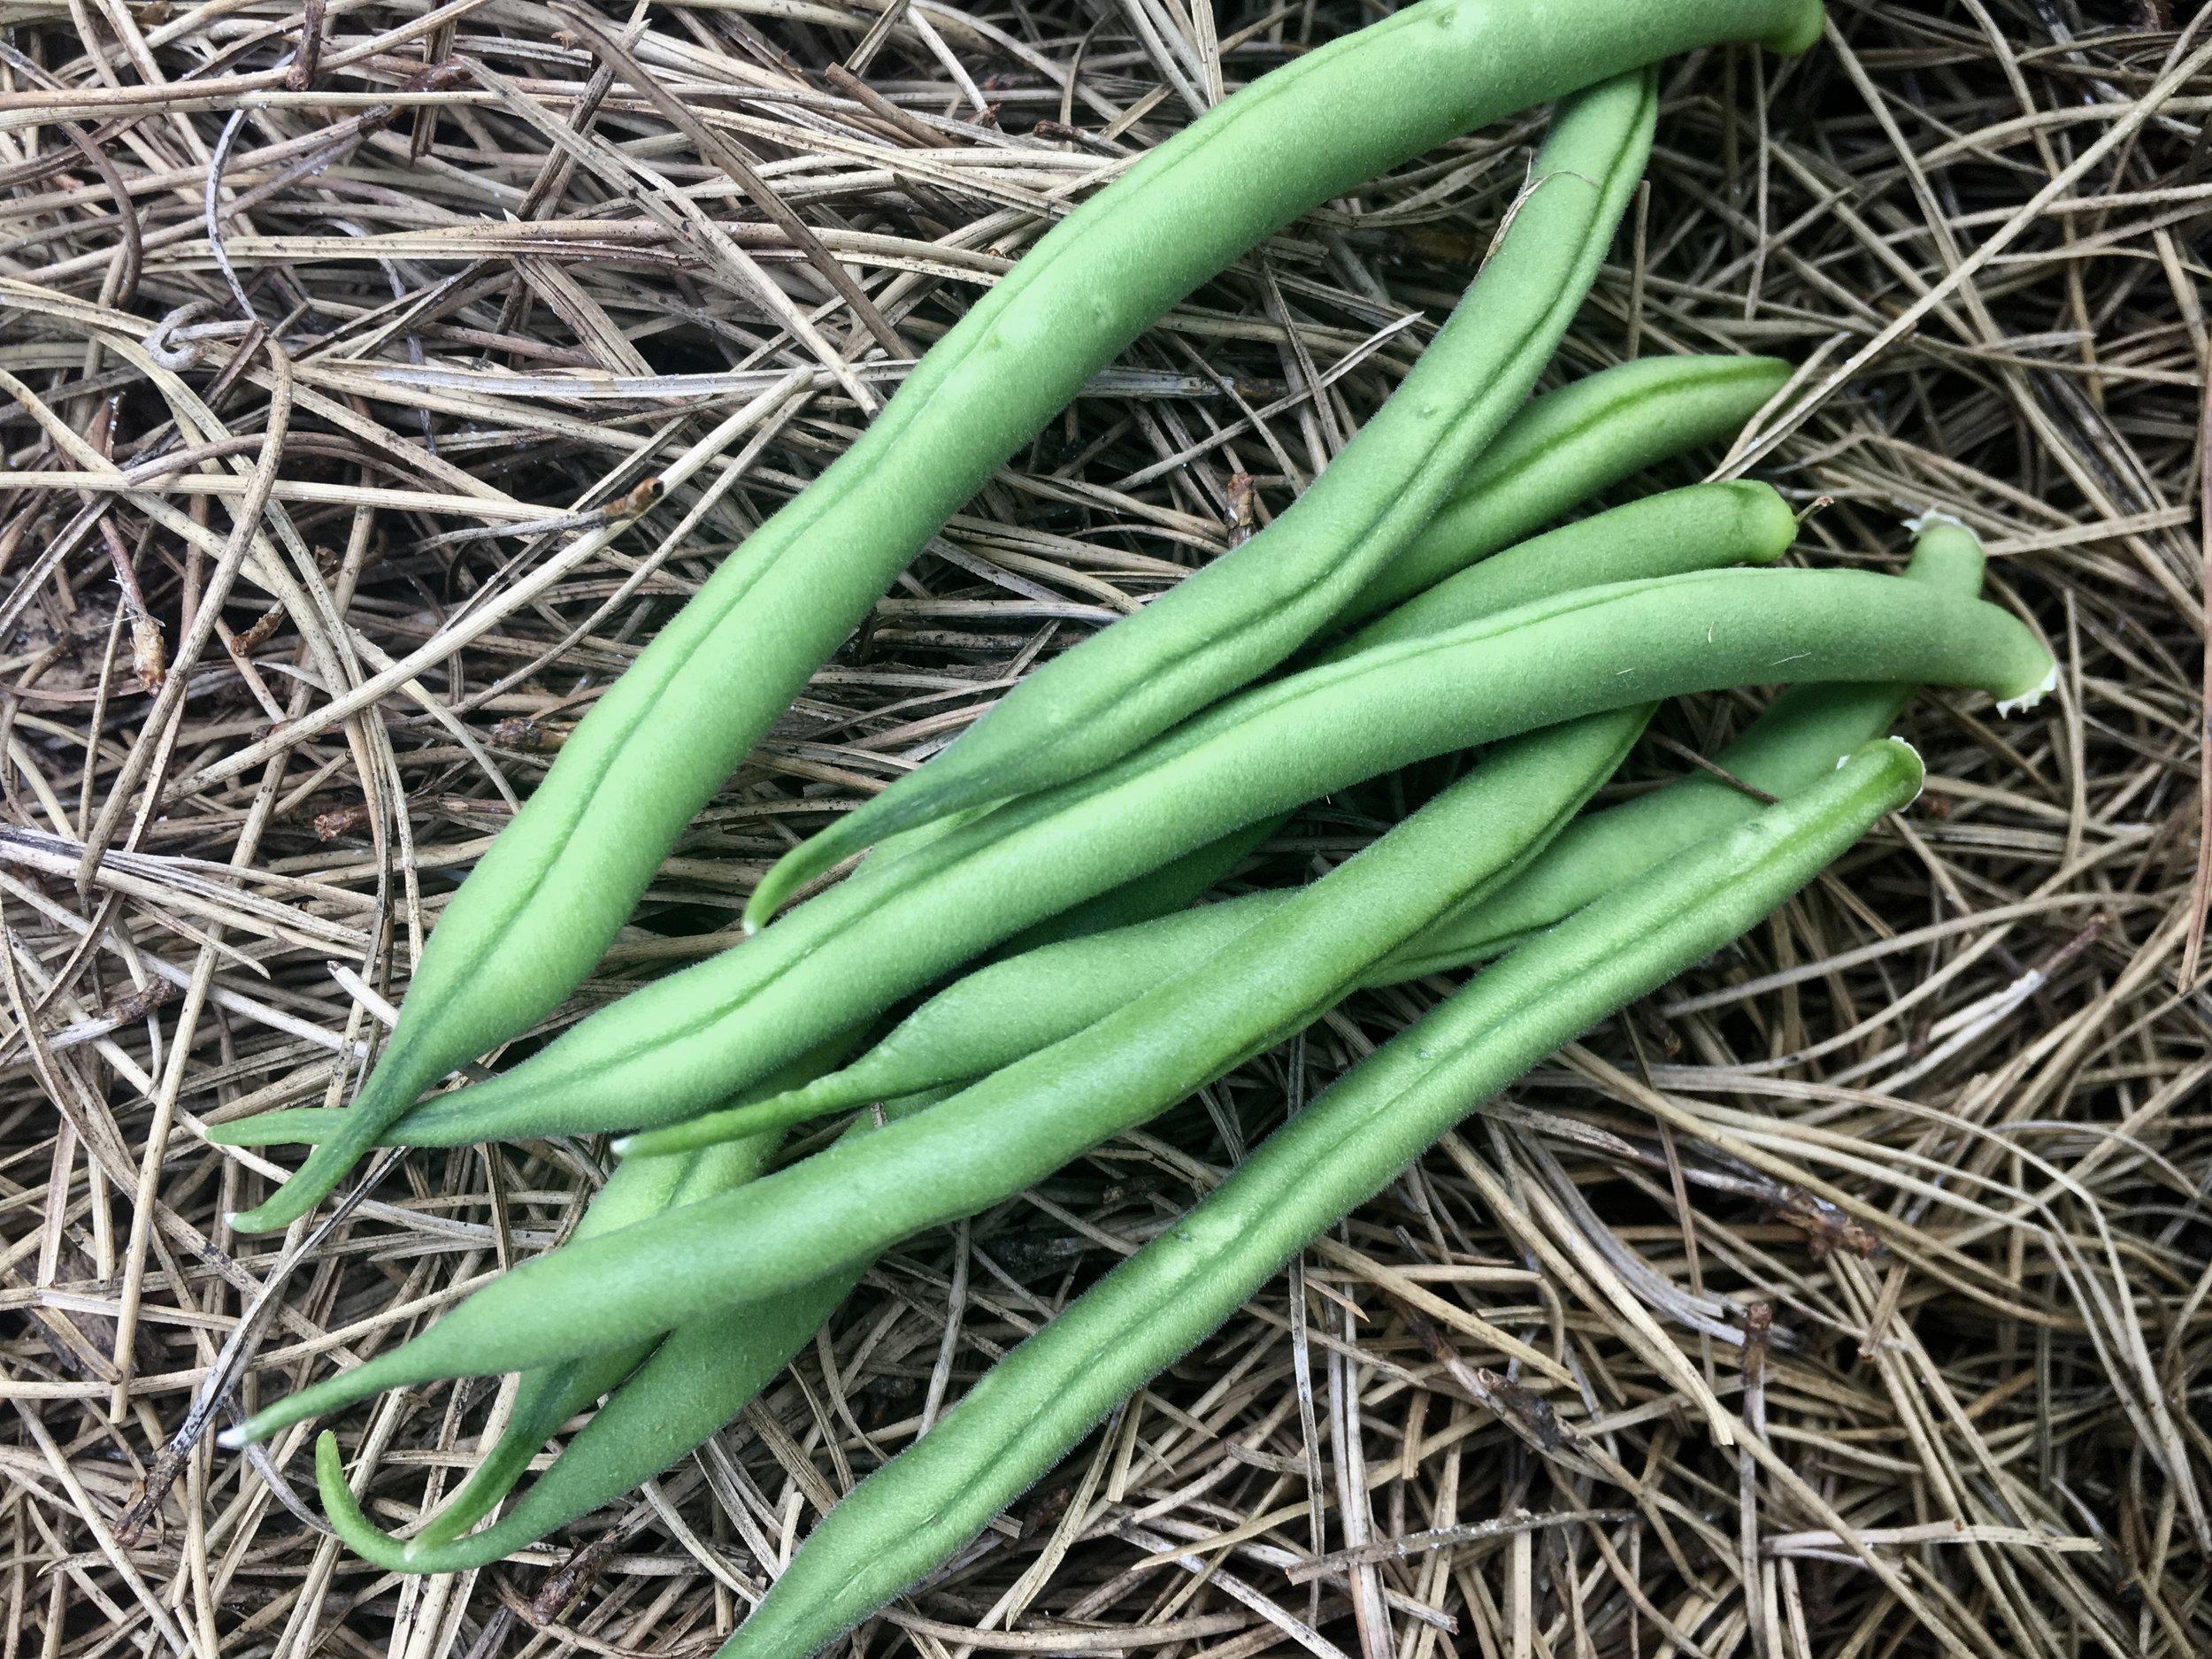 The first bush green beans.